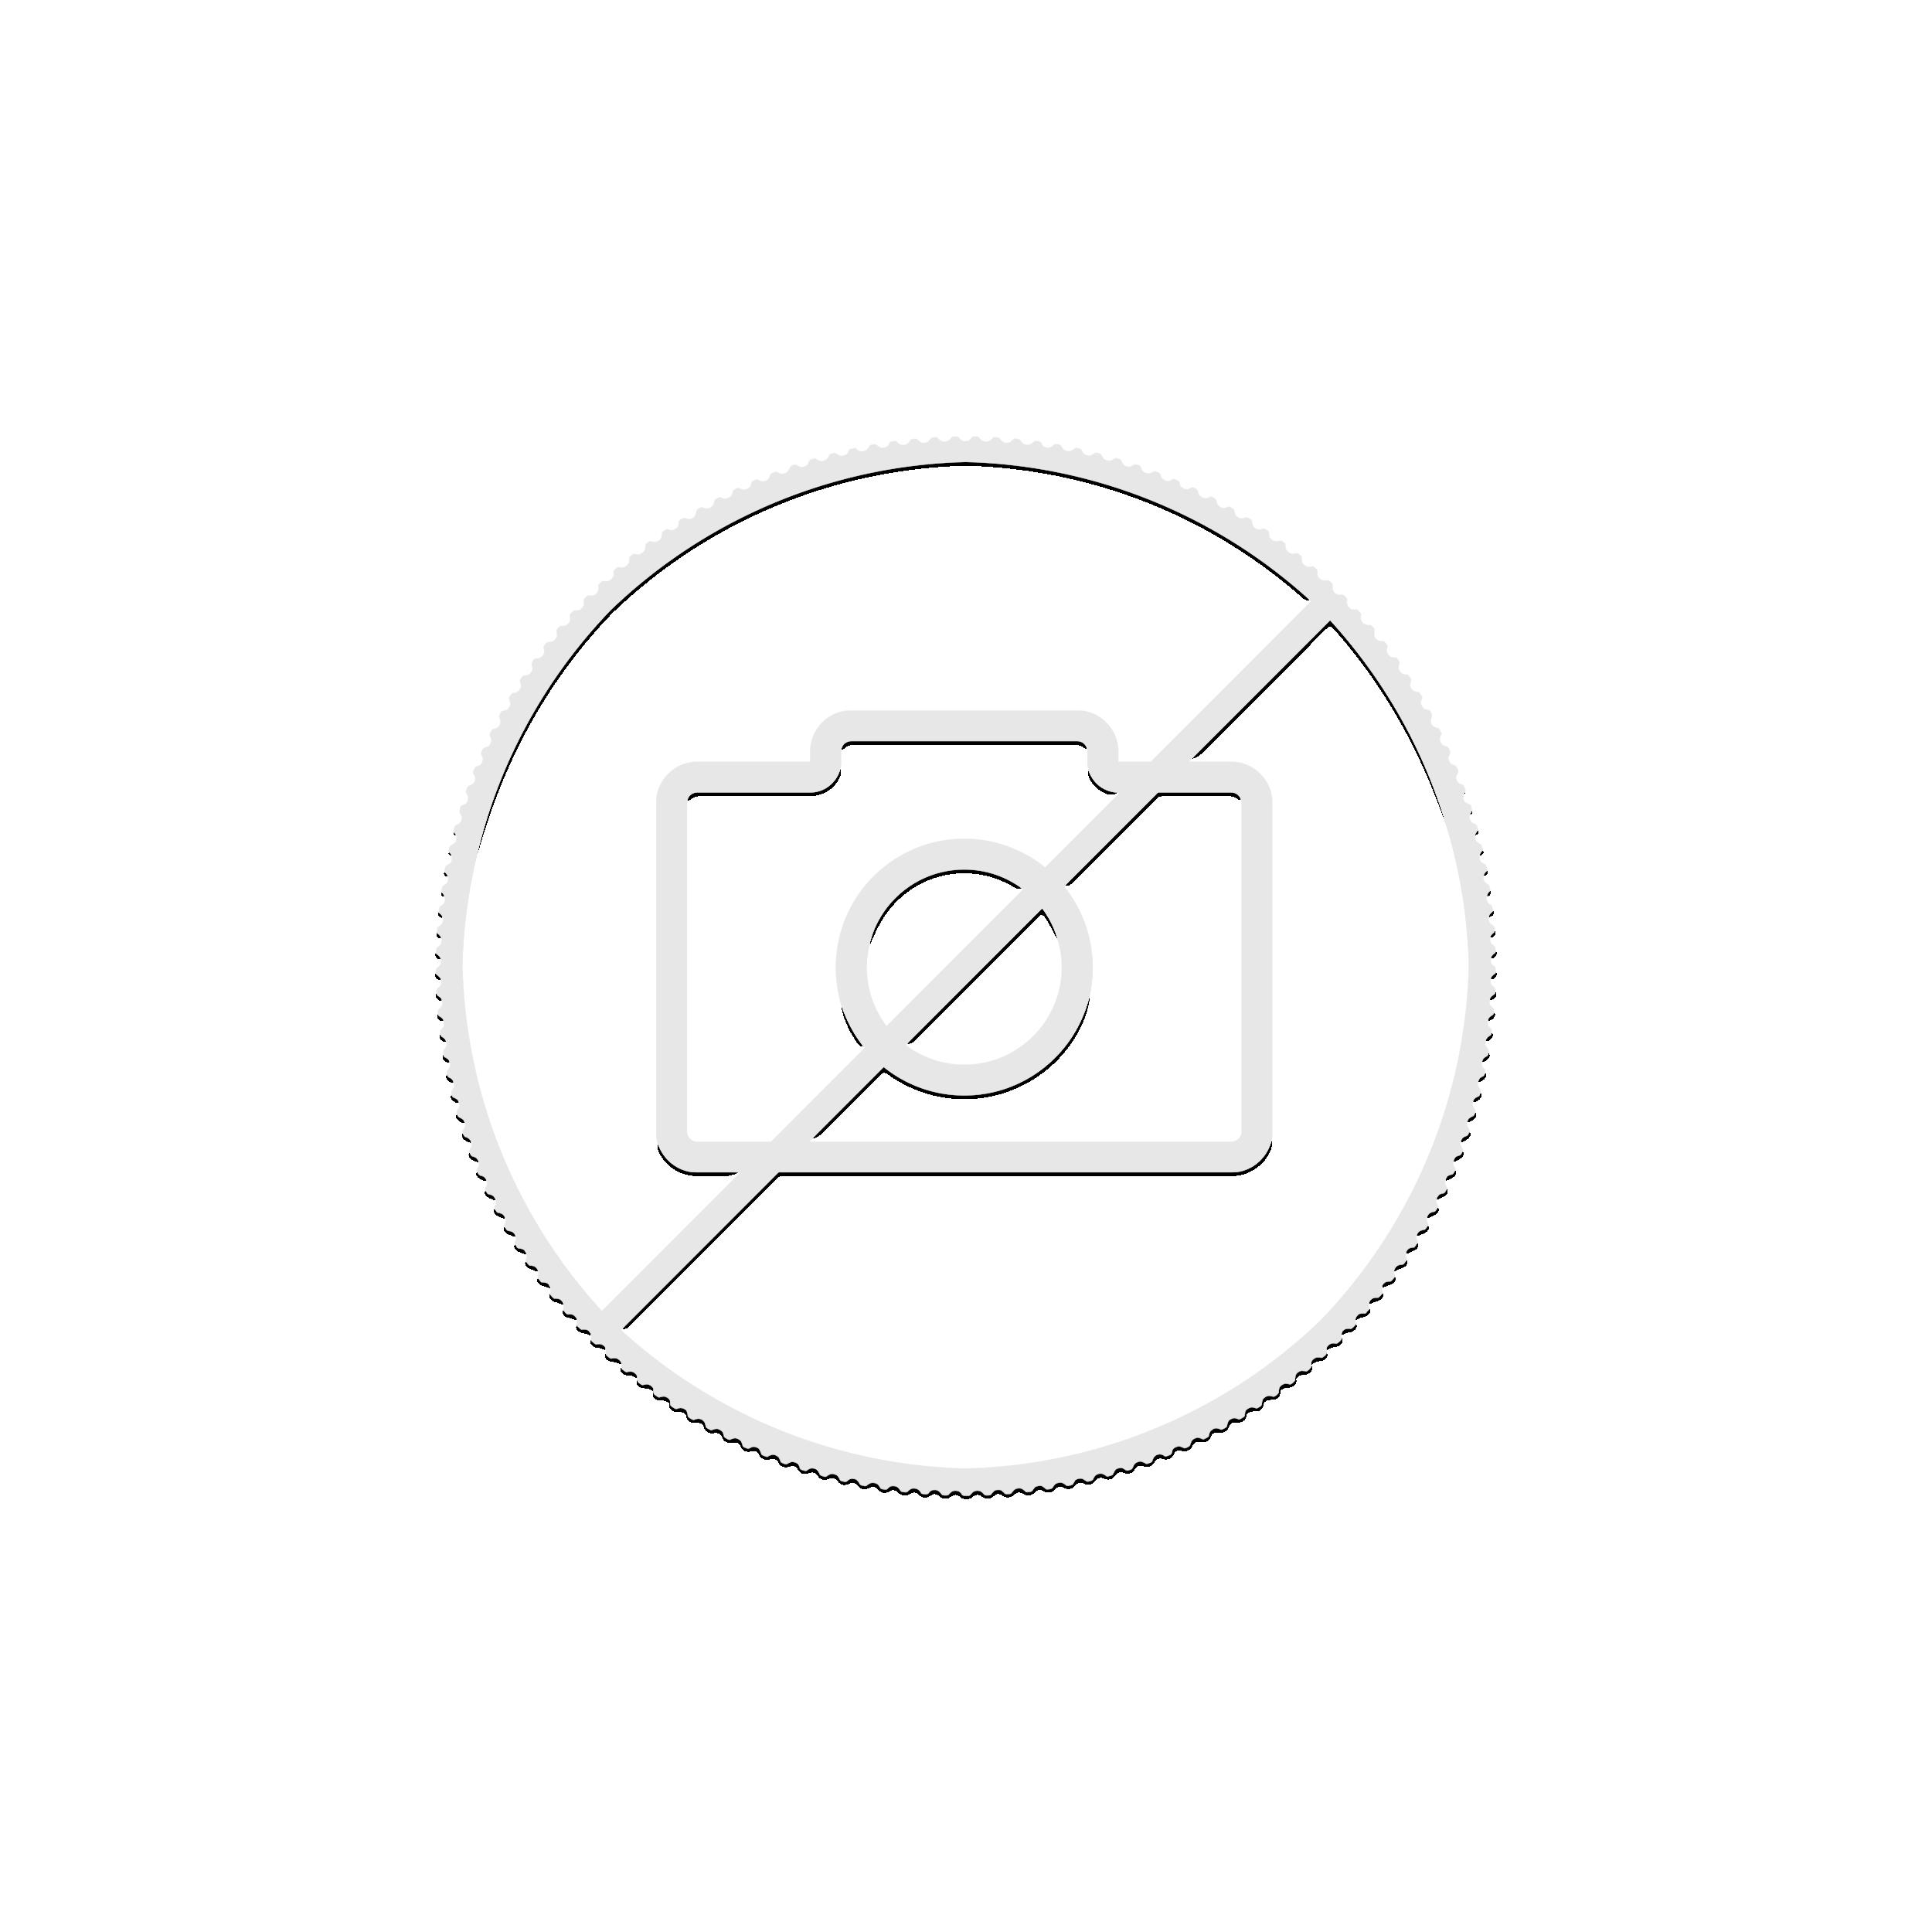 1 troy ounce zilveren munten set Cameleon - American Eagle